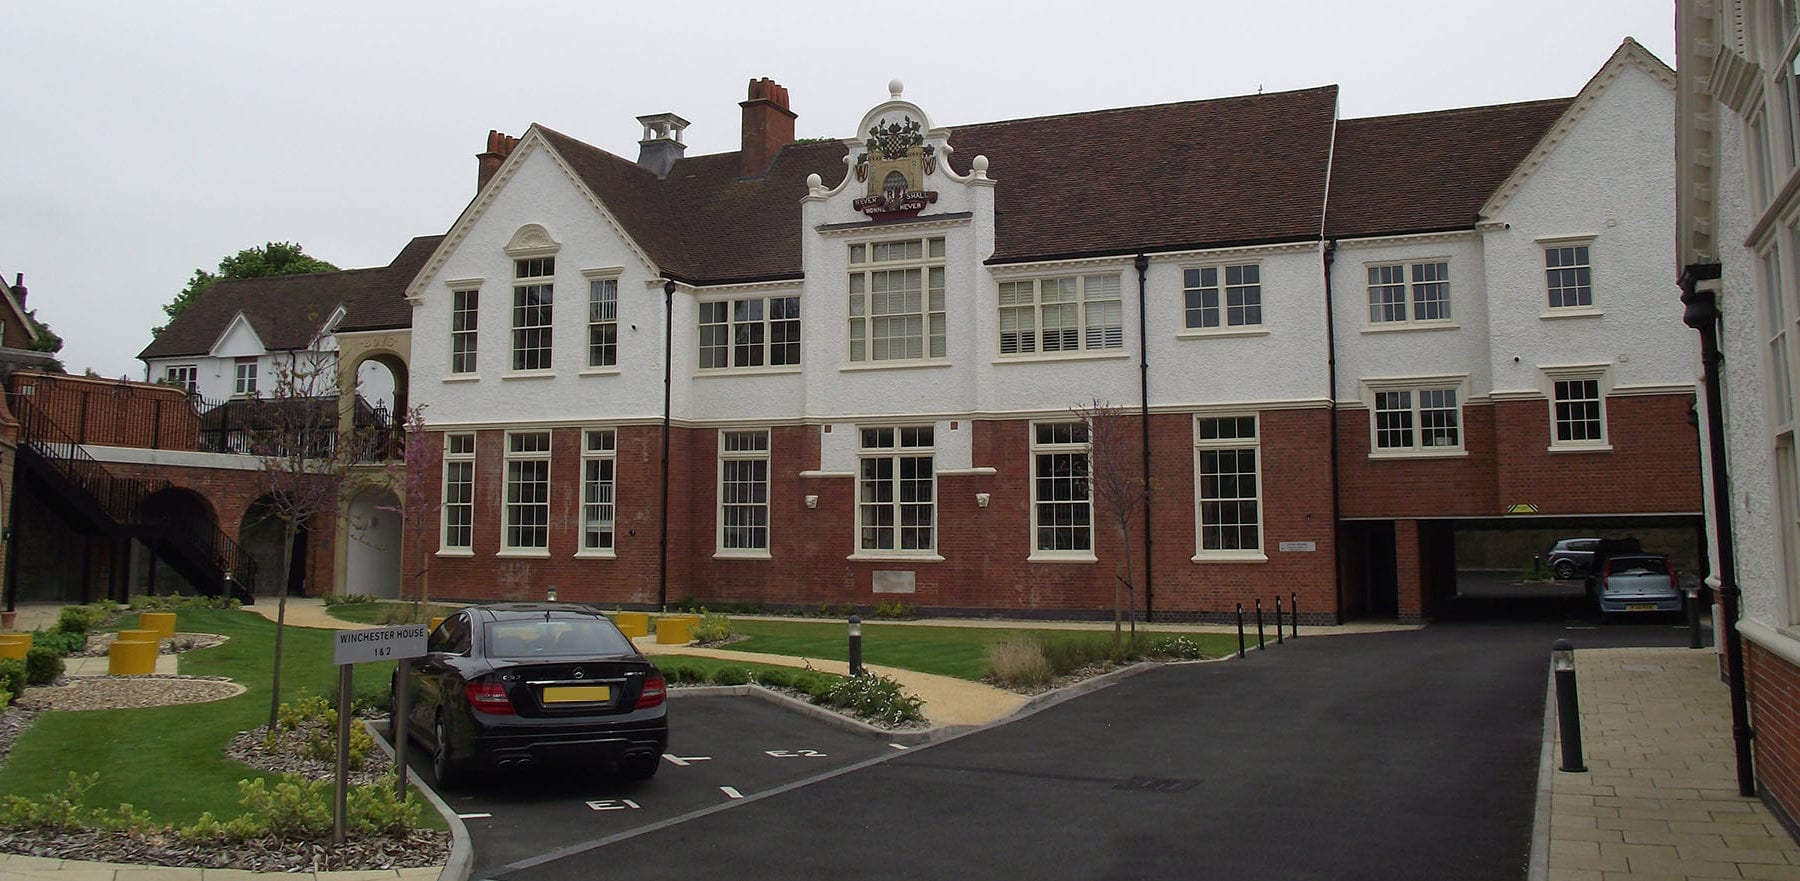 Lifestiles - Handmade Restoration Clay Roof Tiles - Redhill, England 4